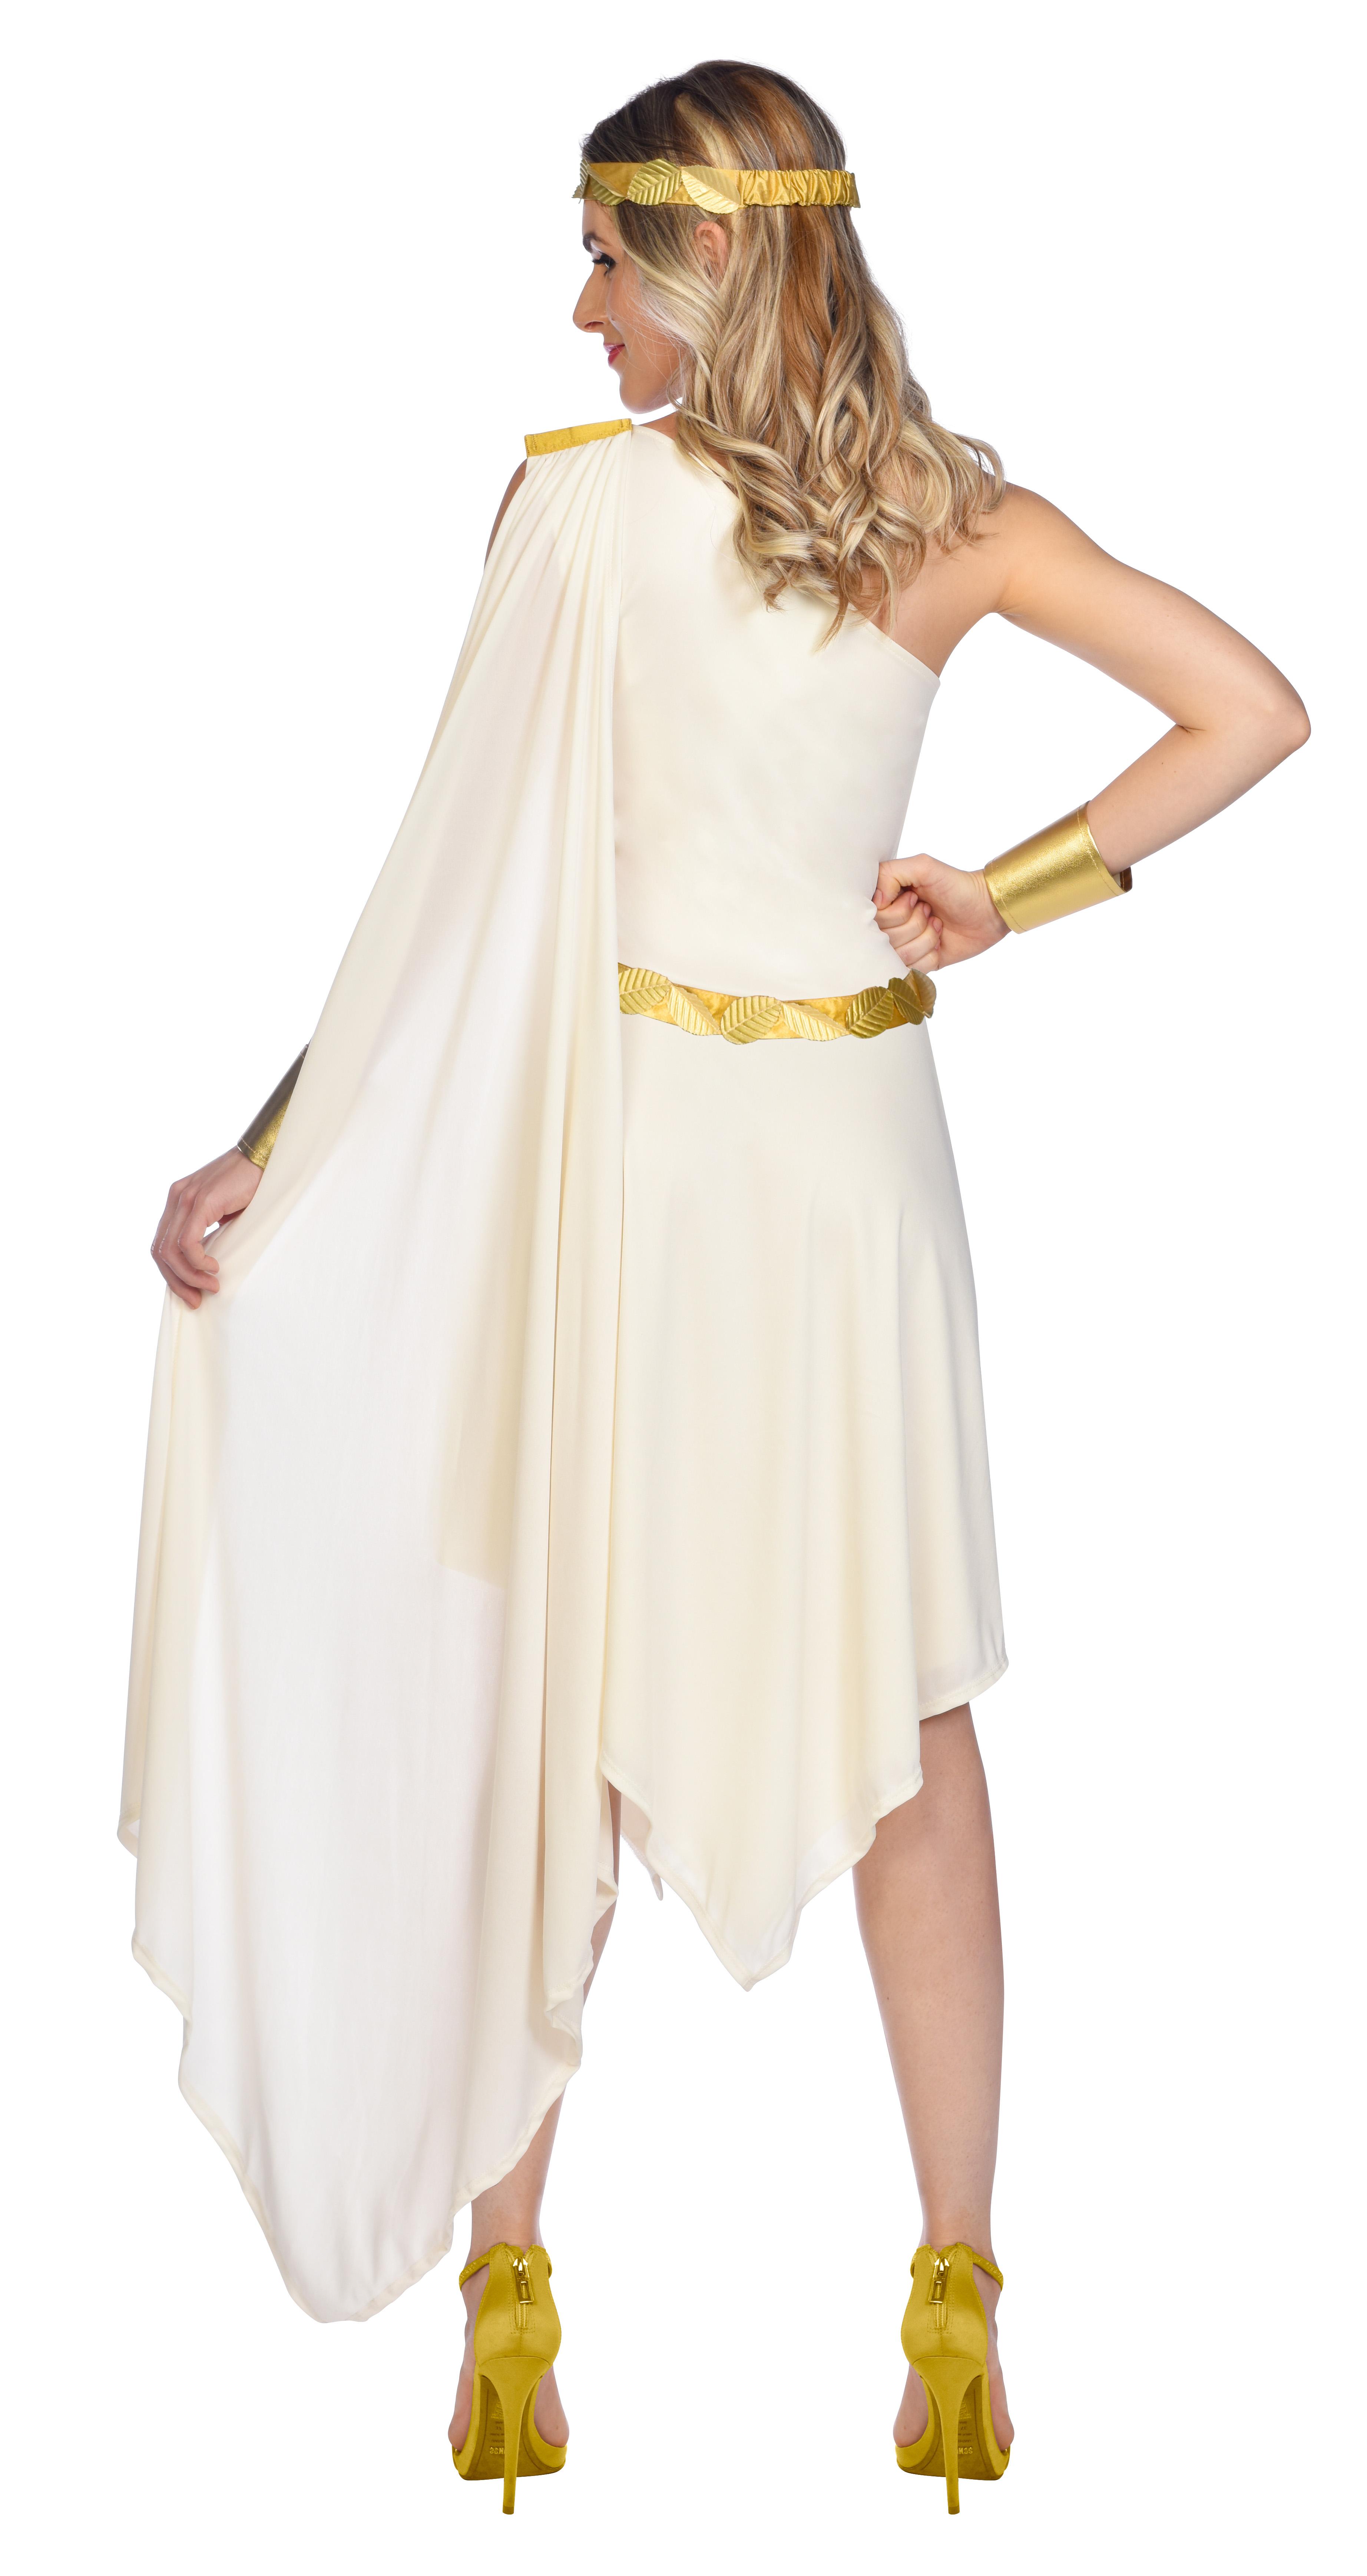 Indexbild 20 - Adult Ladies Golden Goddess Gladiator Greek Roman Toga Fancy Dress Costume New